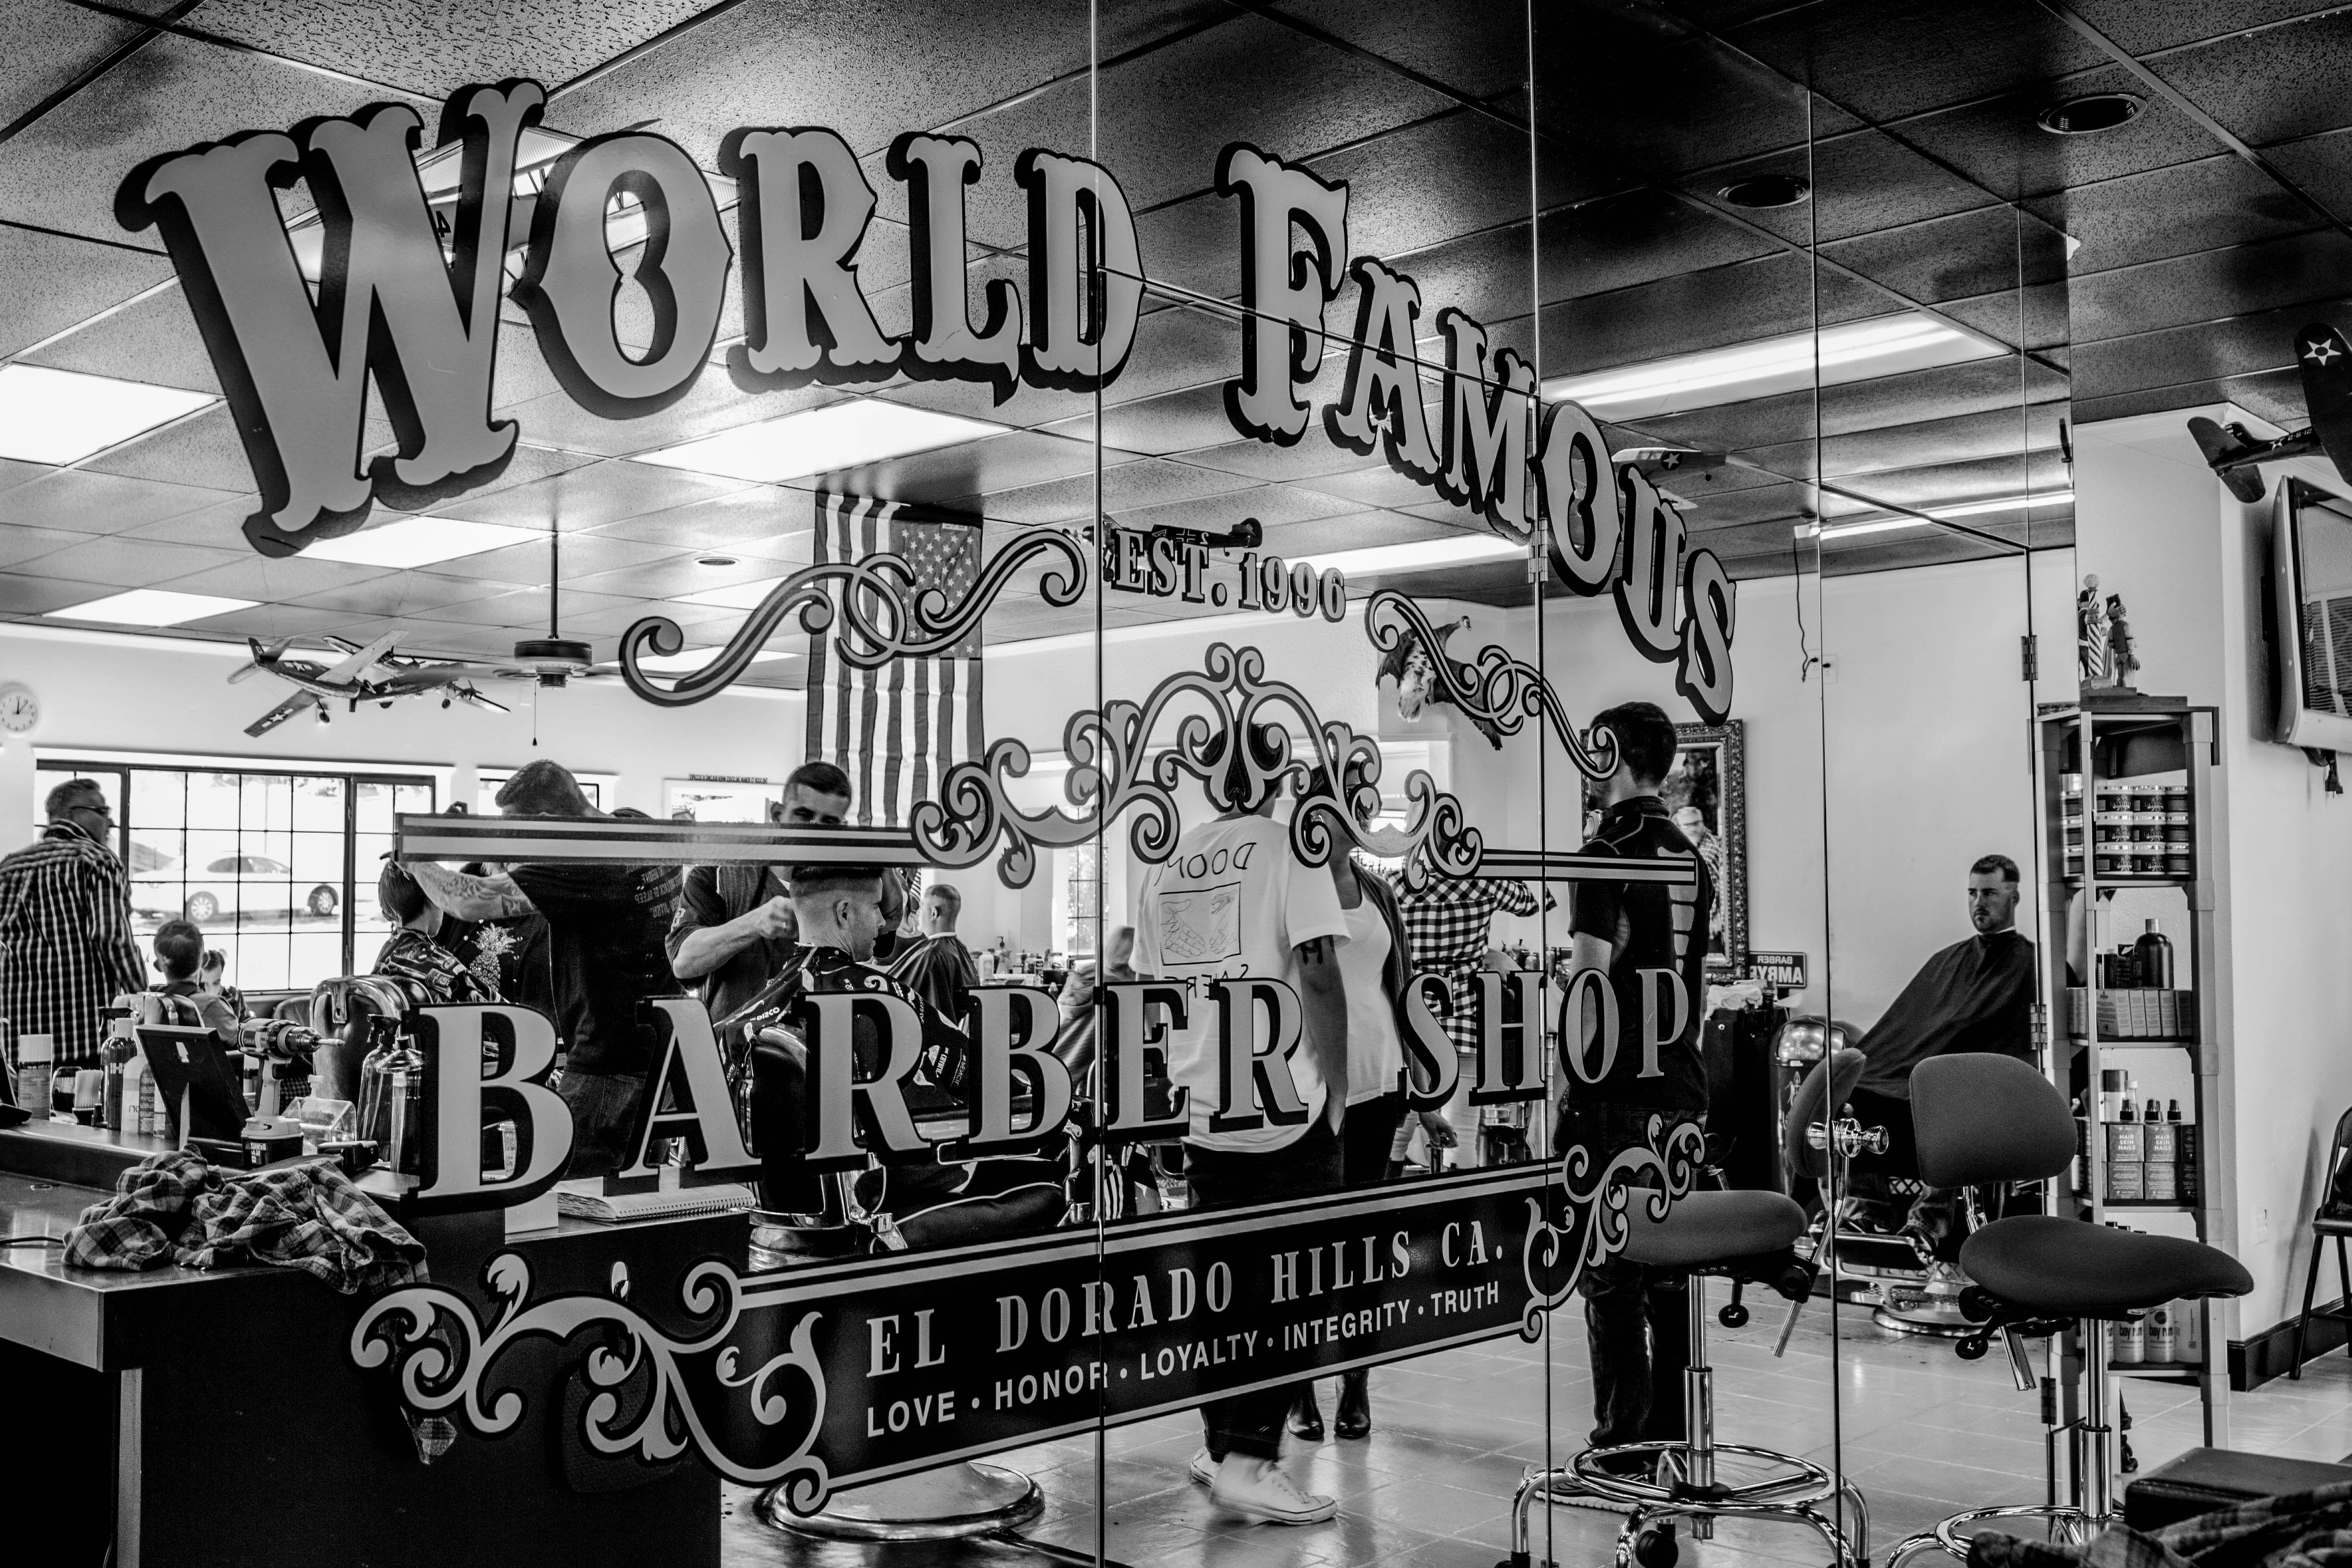 Barber Jons Grand Opening El Dorado Hills